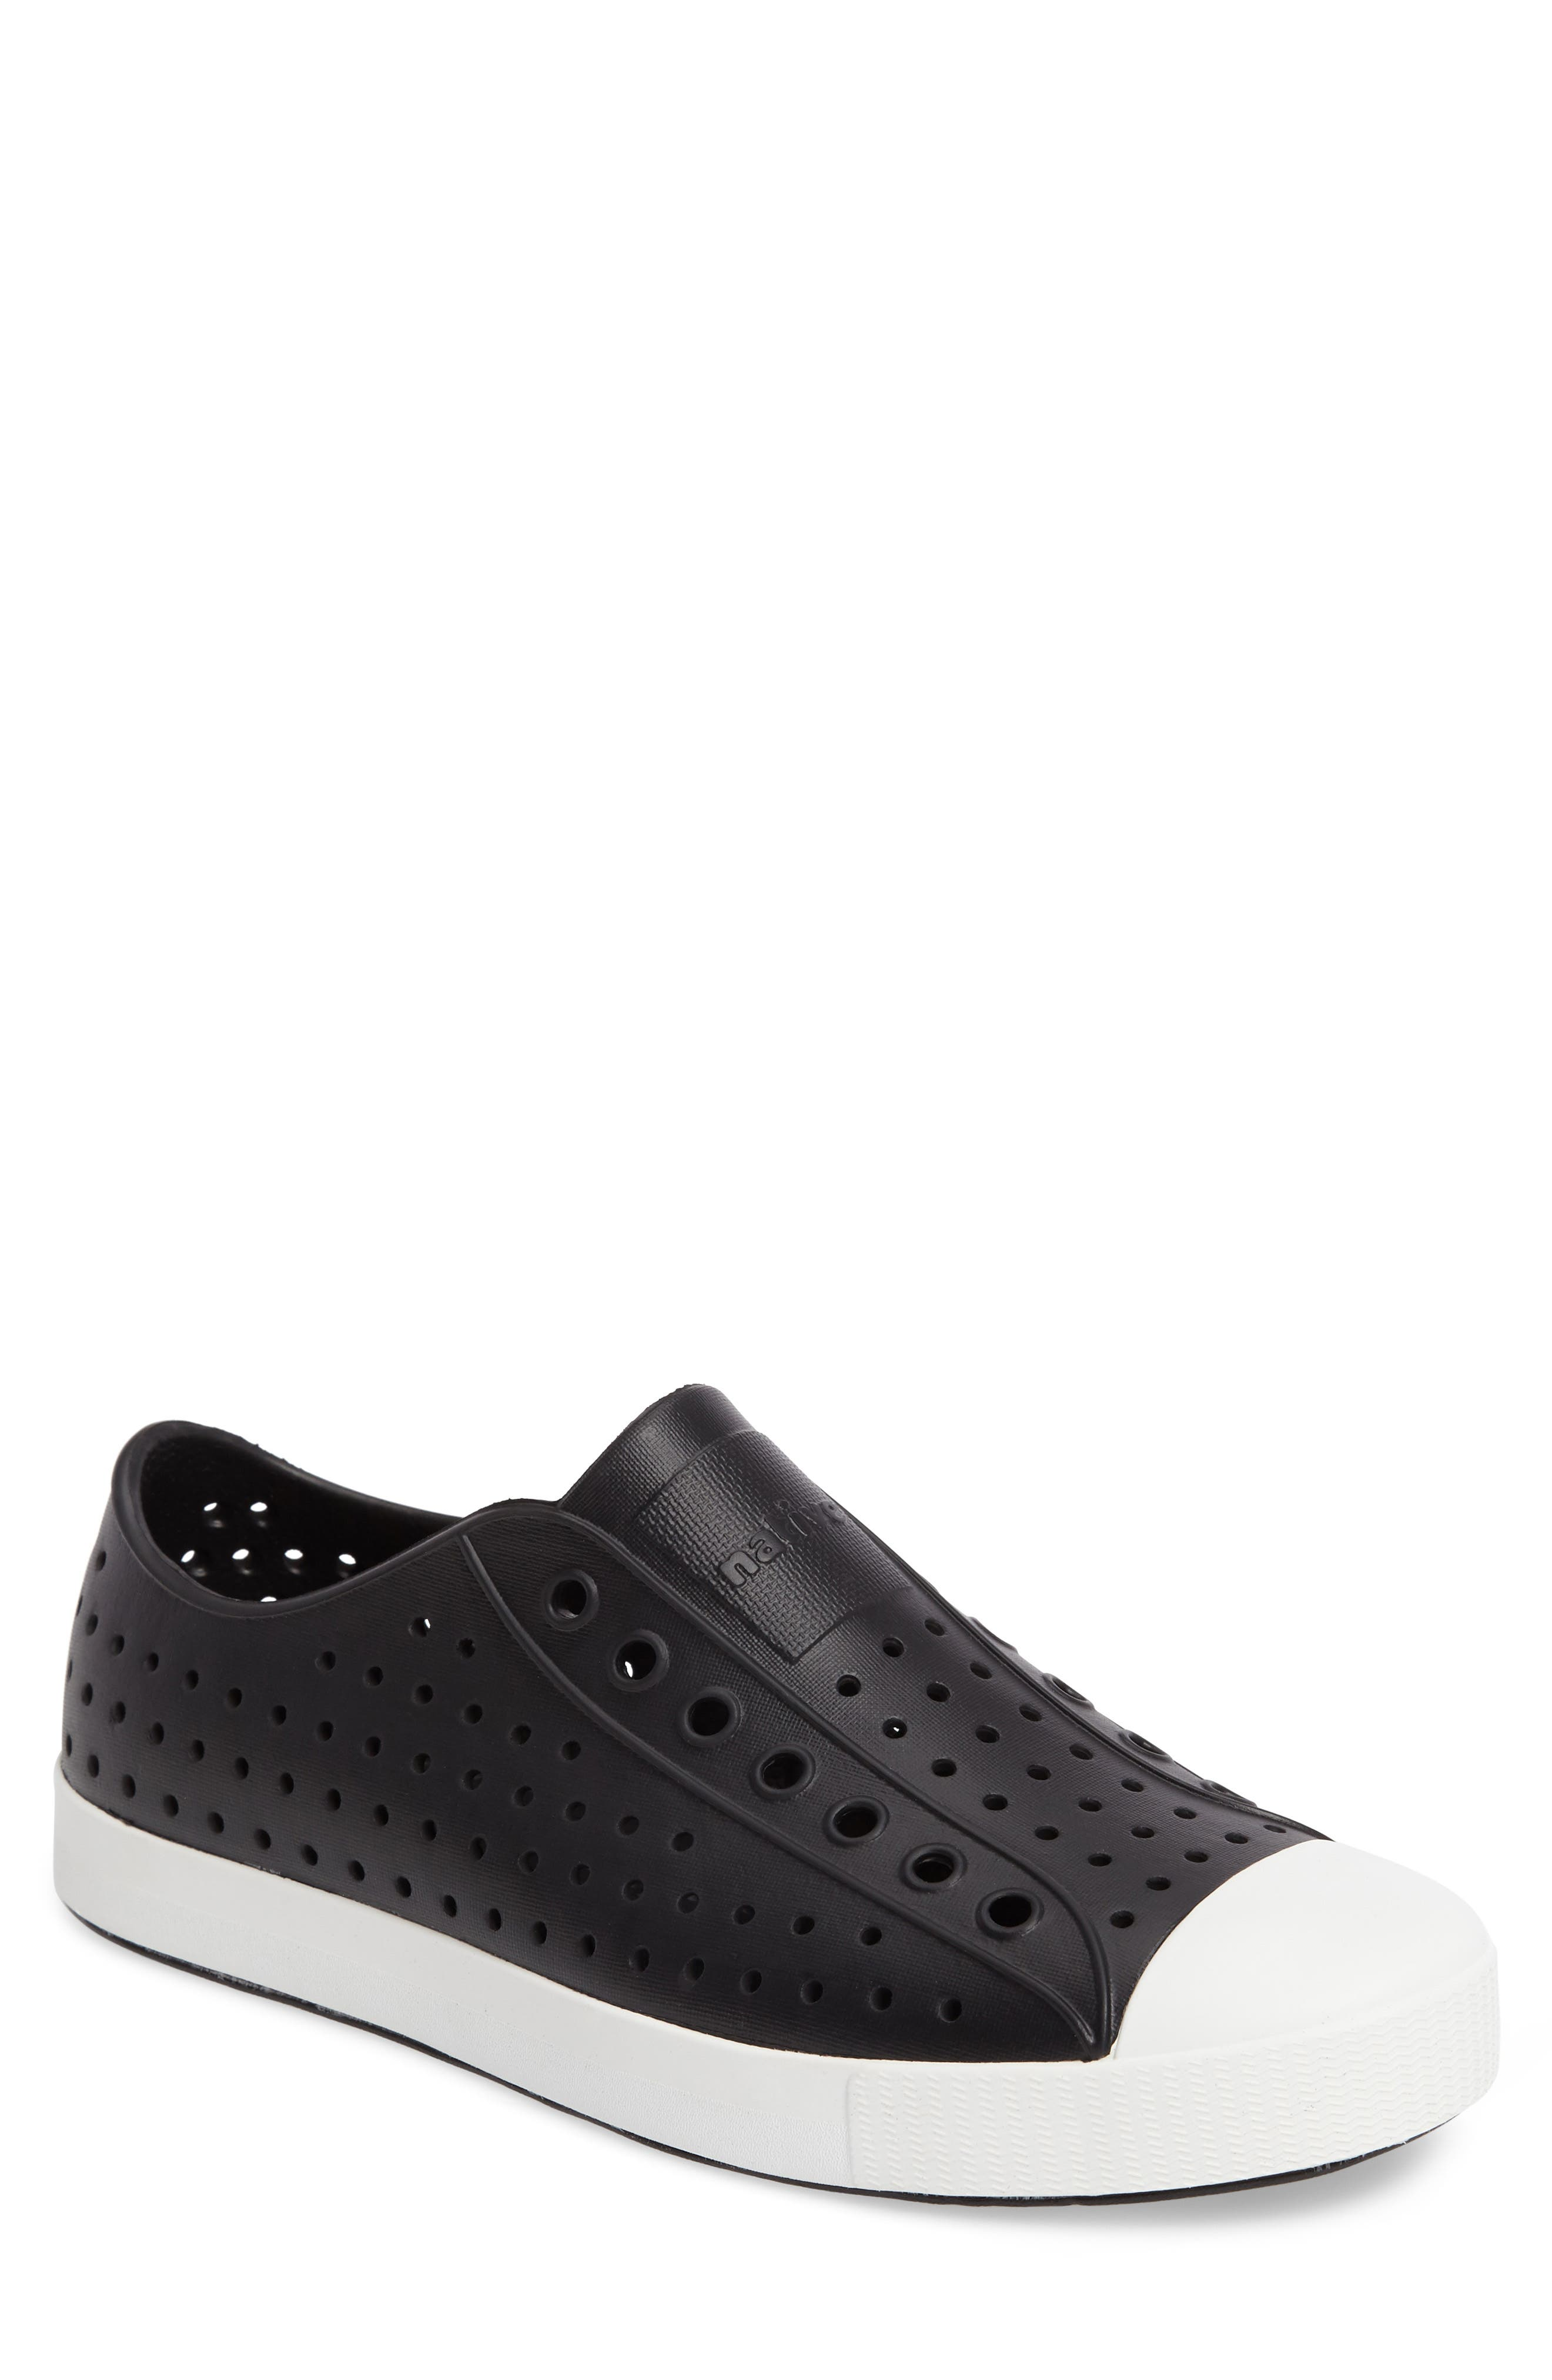 'Jefferson' Slip-On,                         Main,                         color, JIFFY BLACK/ SHELL WHITE